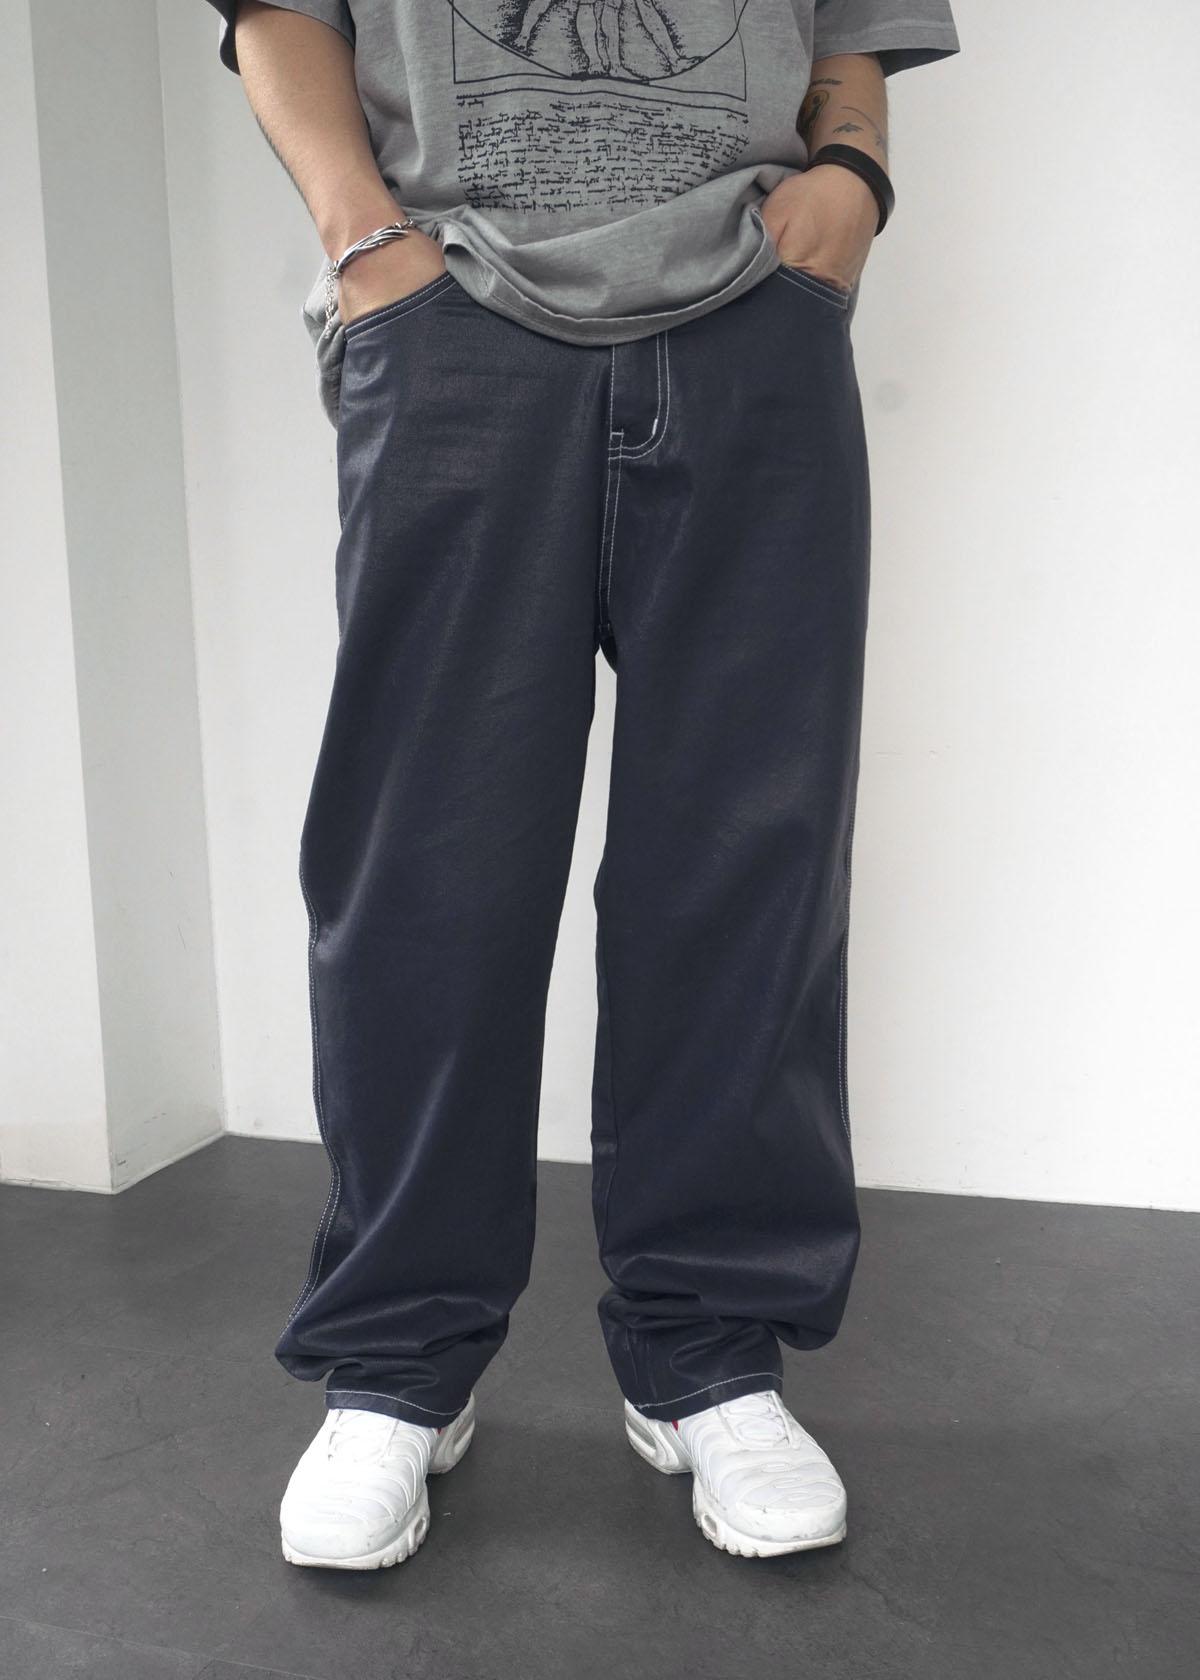 Coating Stitch Wide Pants (2Color)